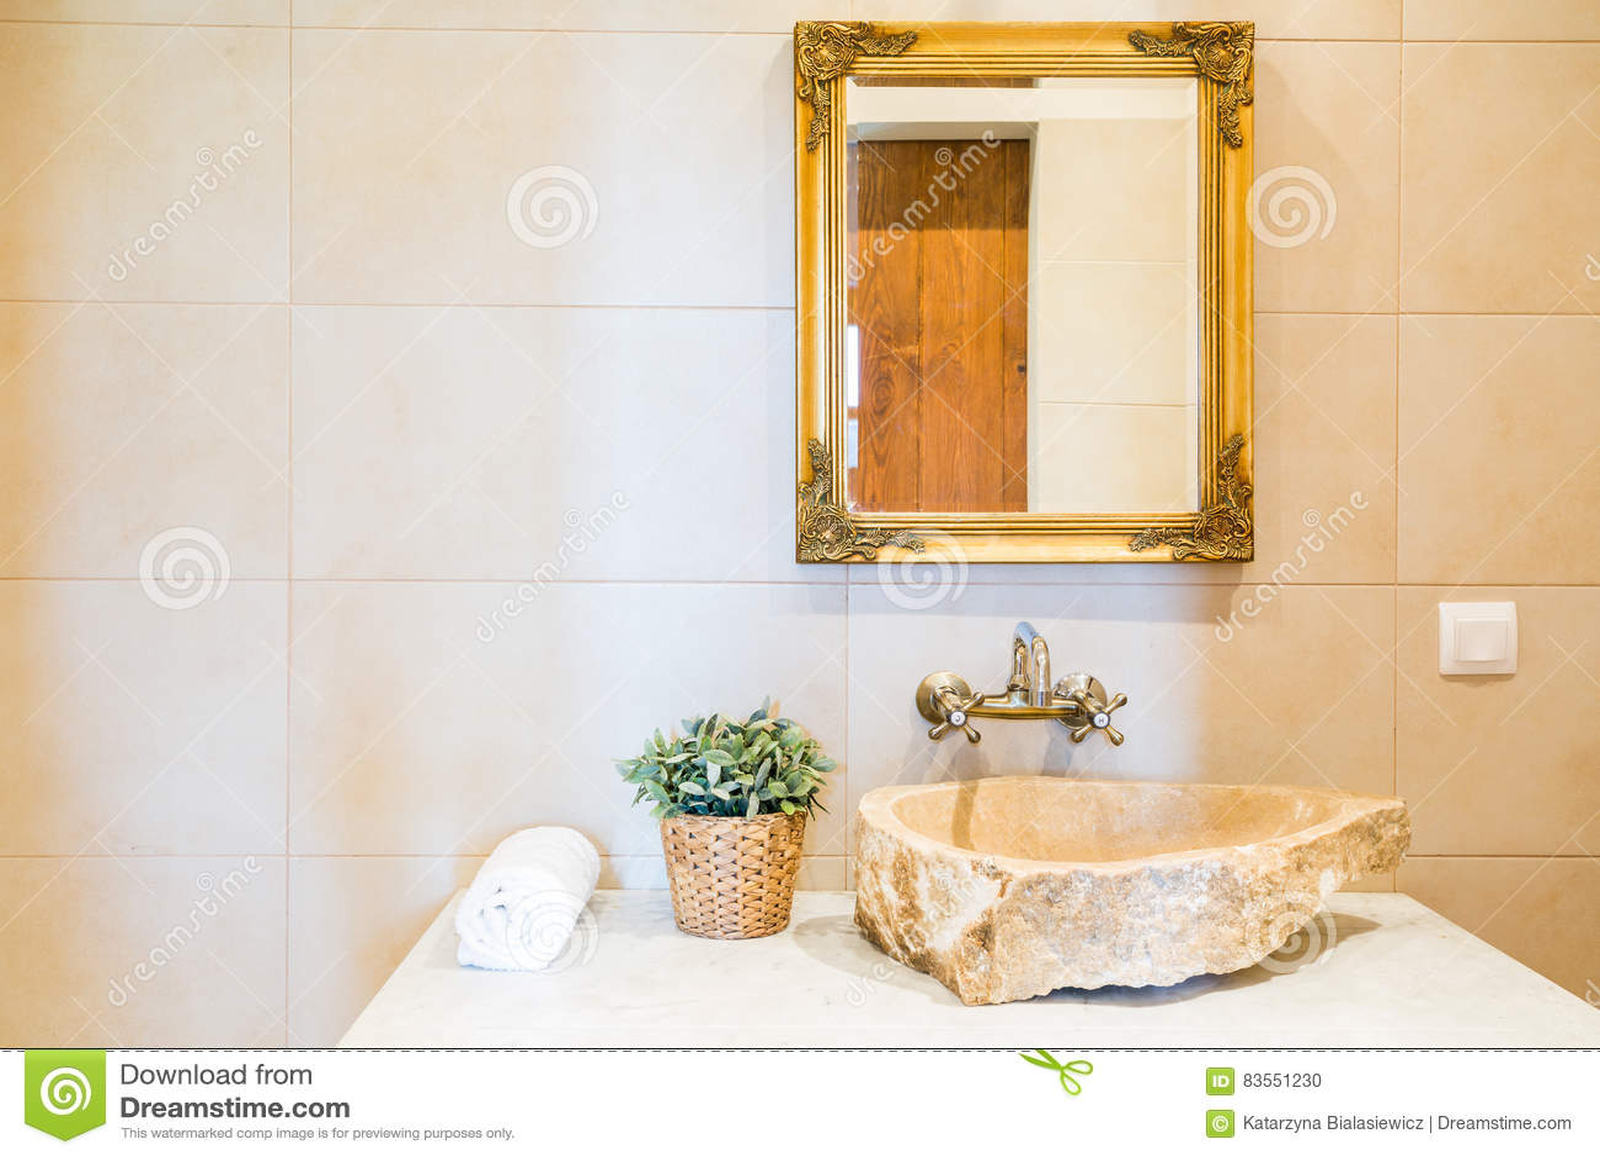 Lavabo in resina e pietra iperceramica